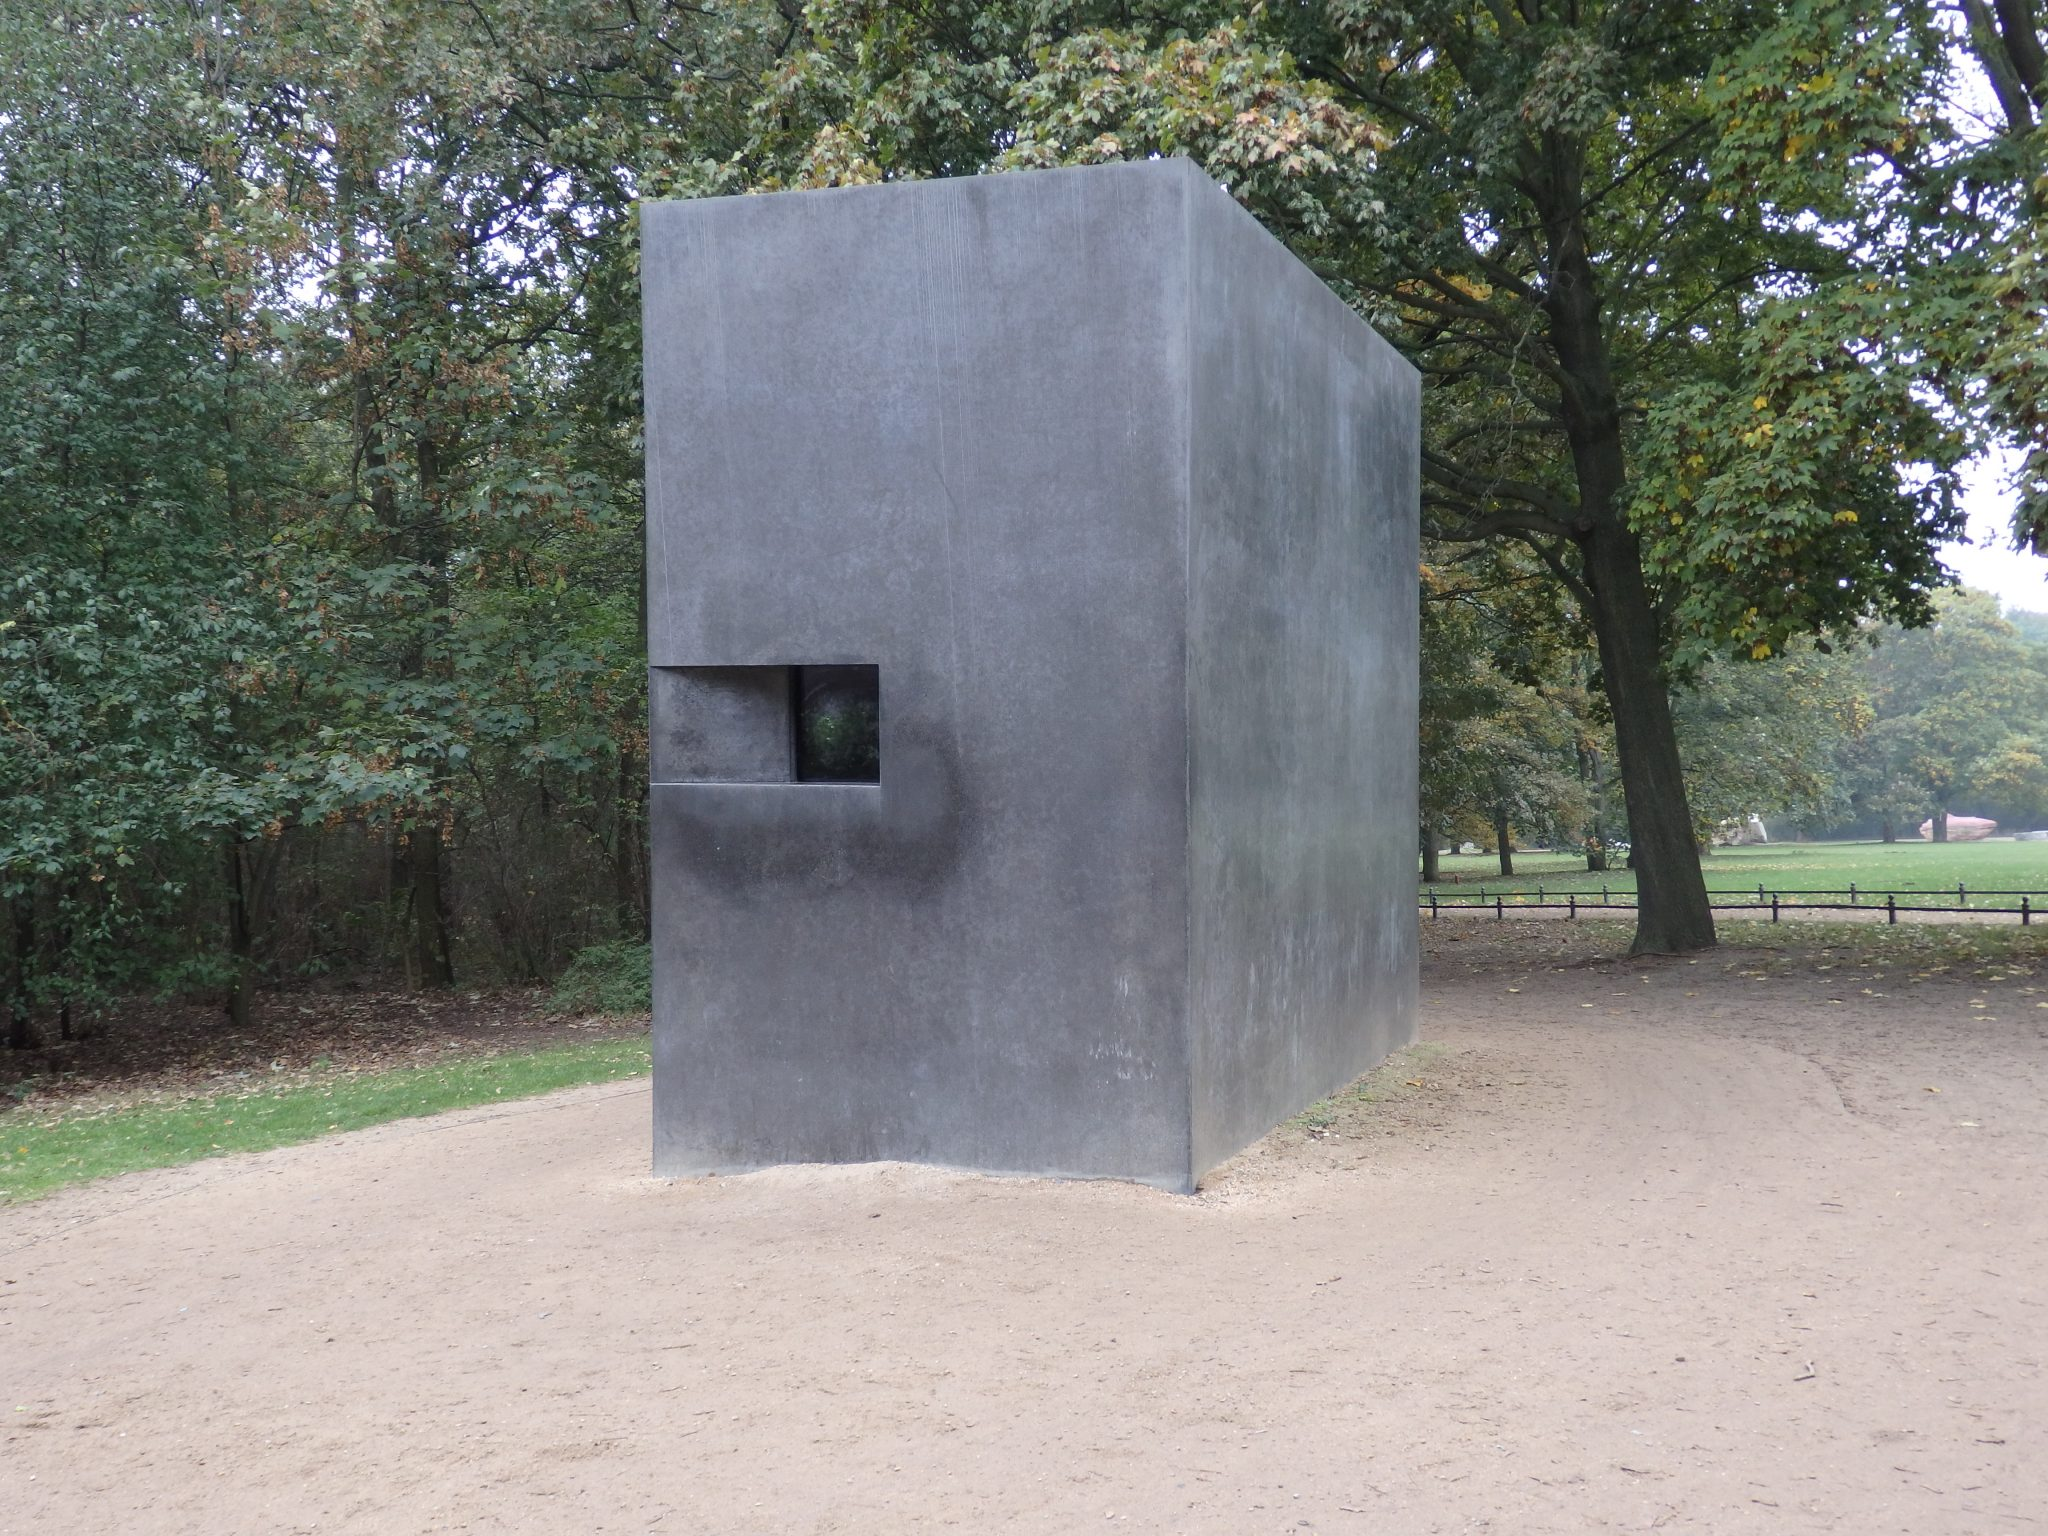 the Memorial to Homosexuals Persecuted Under Nazism in Berlin